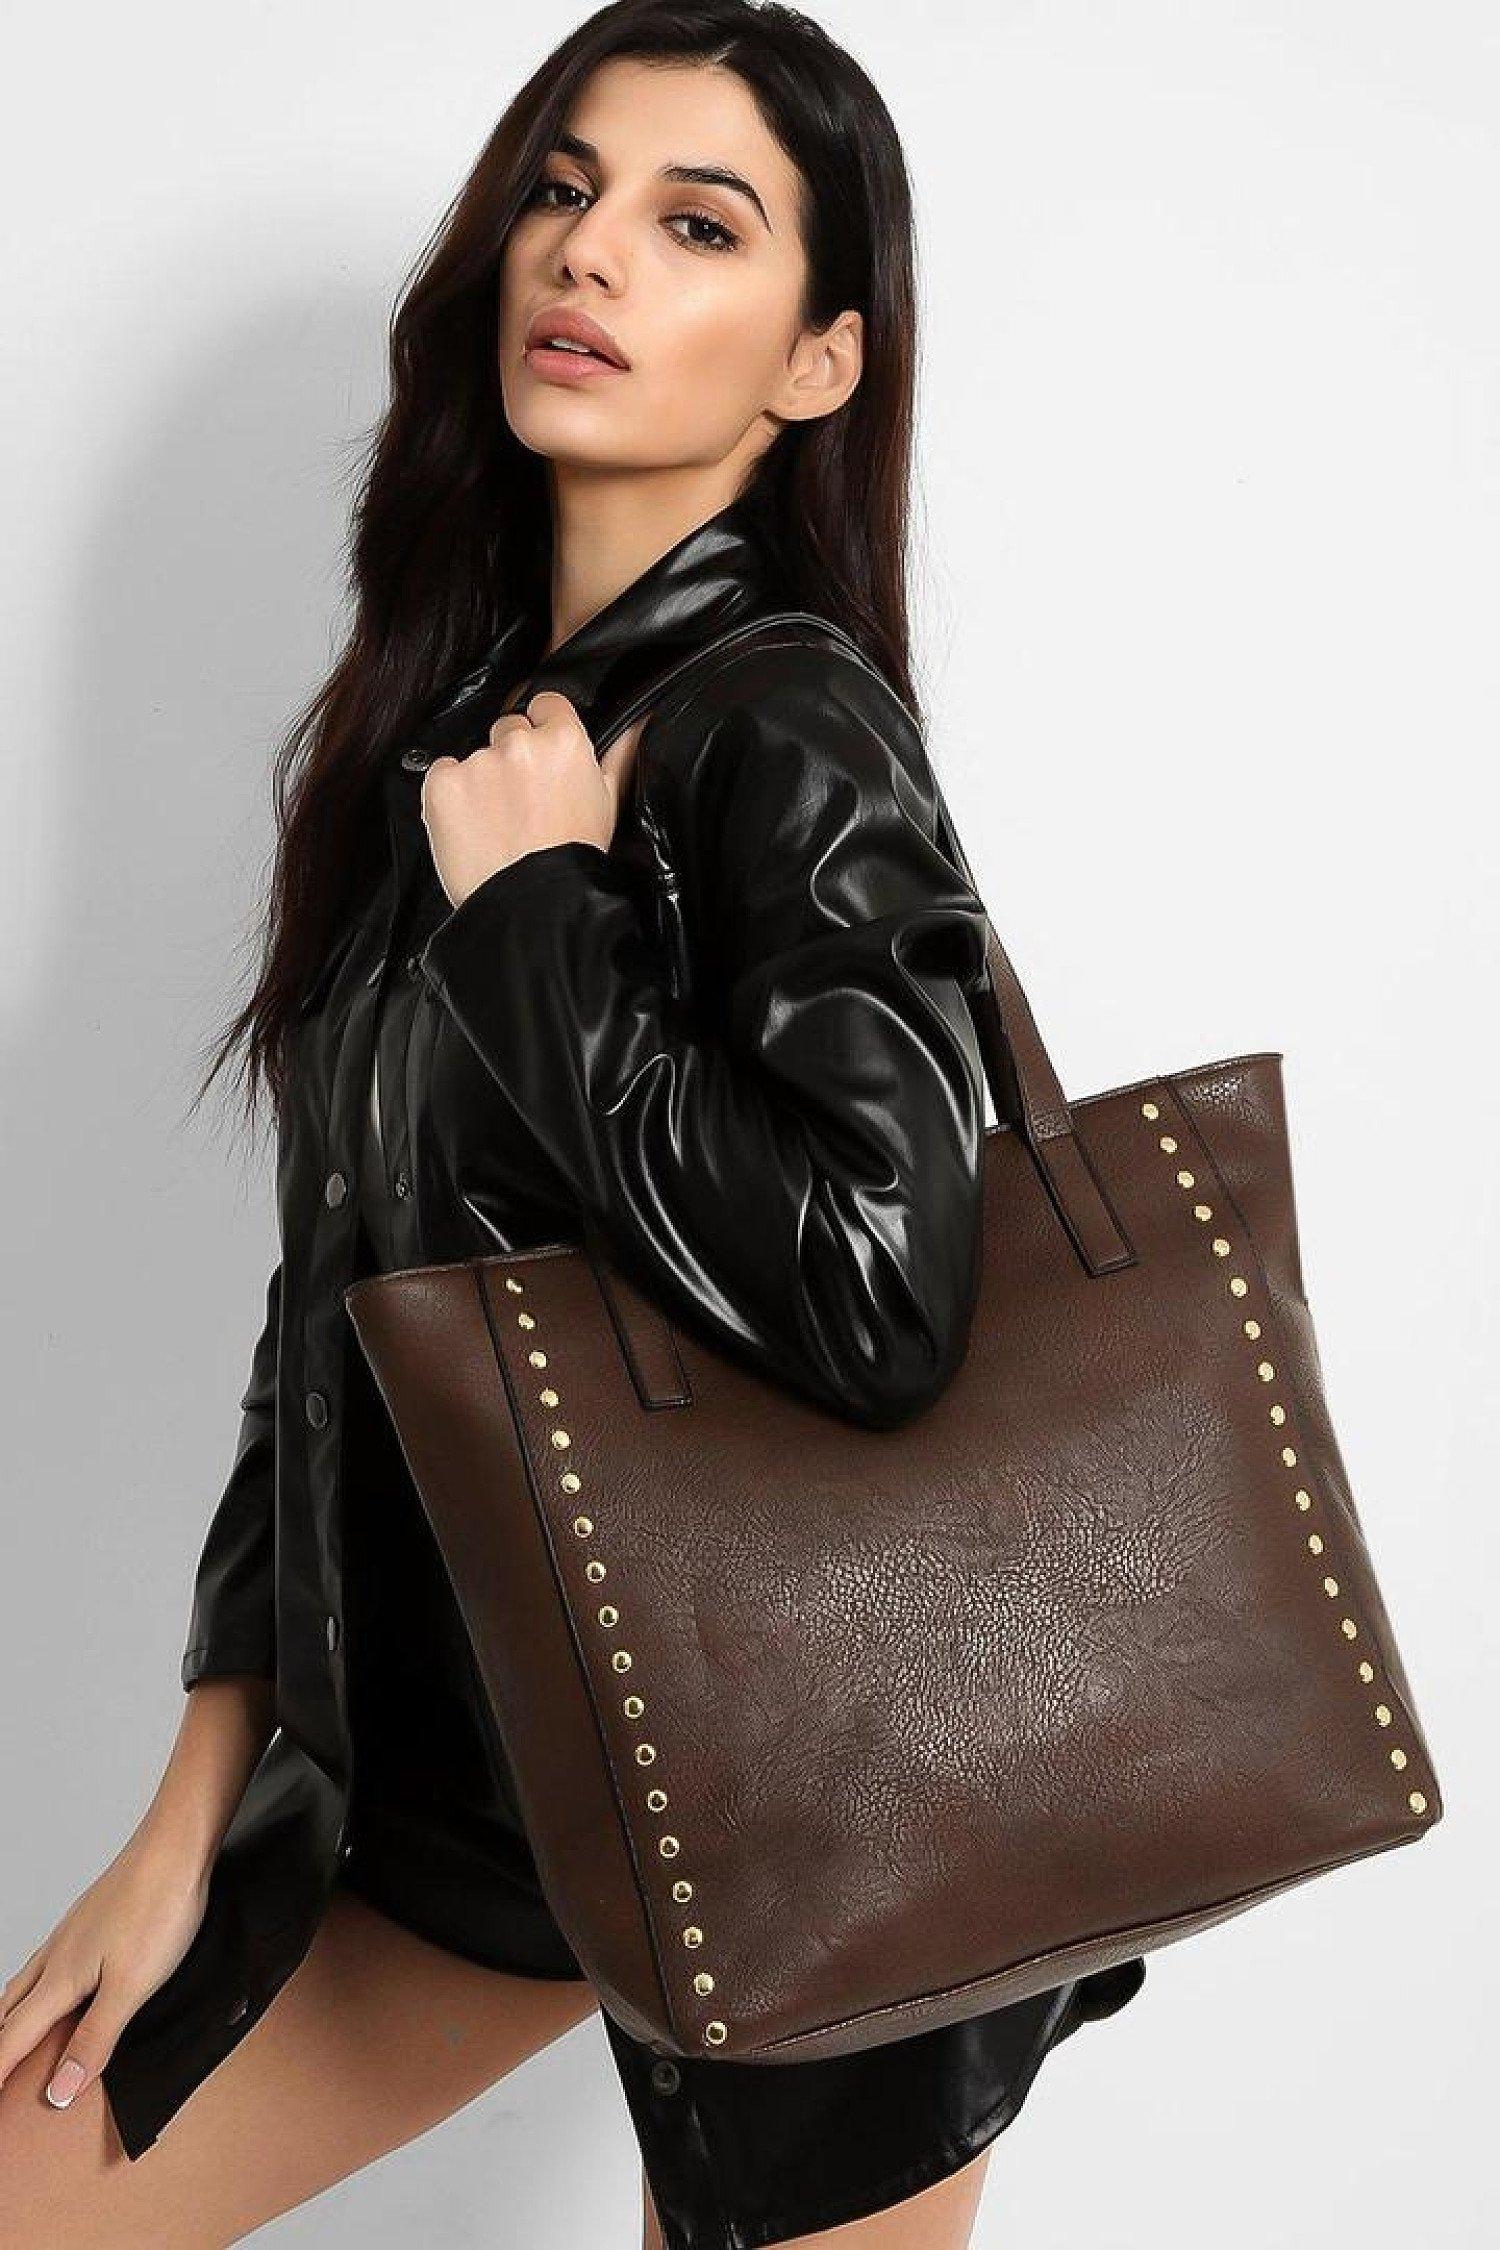 Dark Brown Leather Gold Stud Bag Free Postage